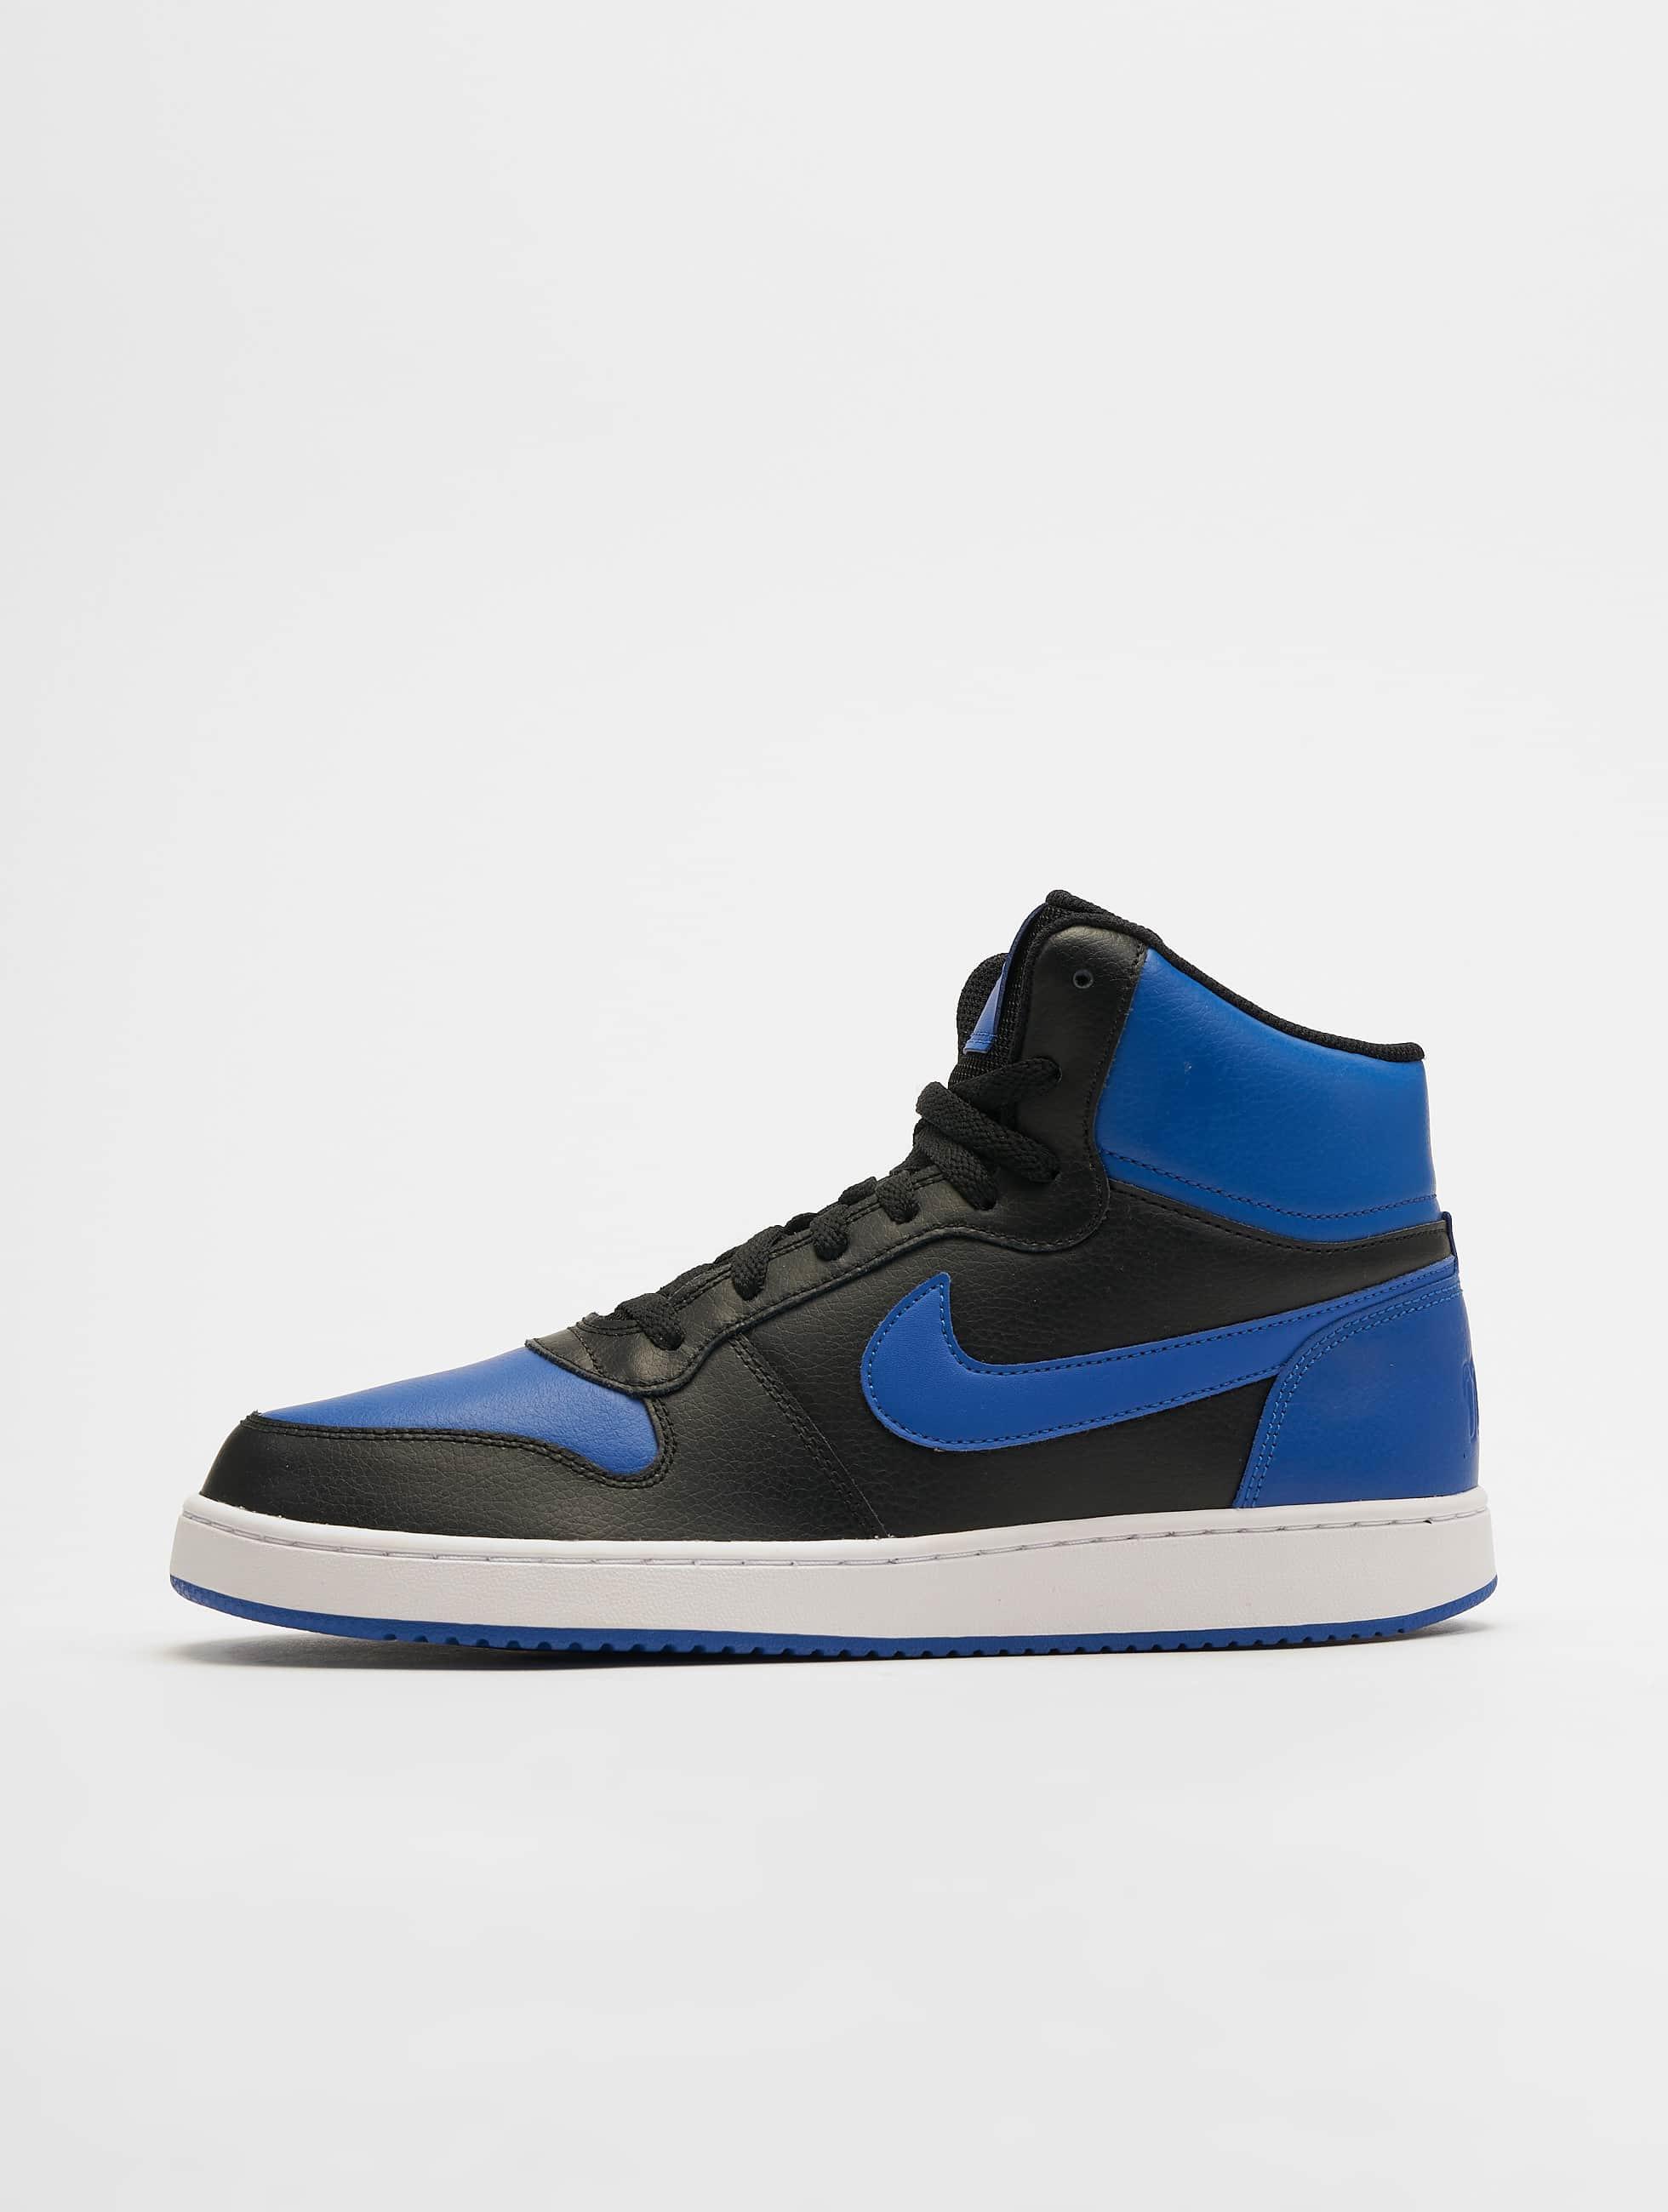 a0bc05d6646 Nike schoen / sneaker Ebernon Mid in zwart 536094